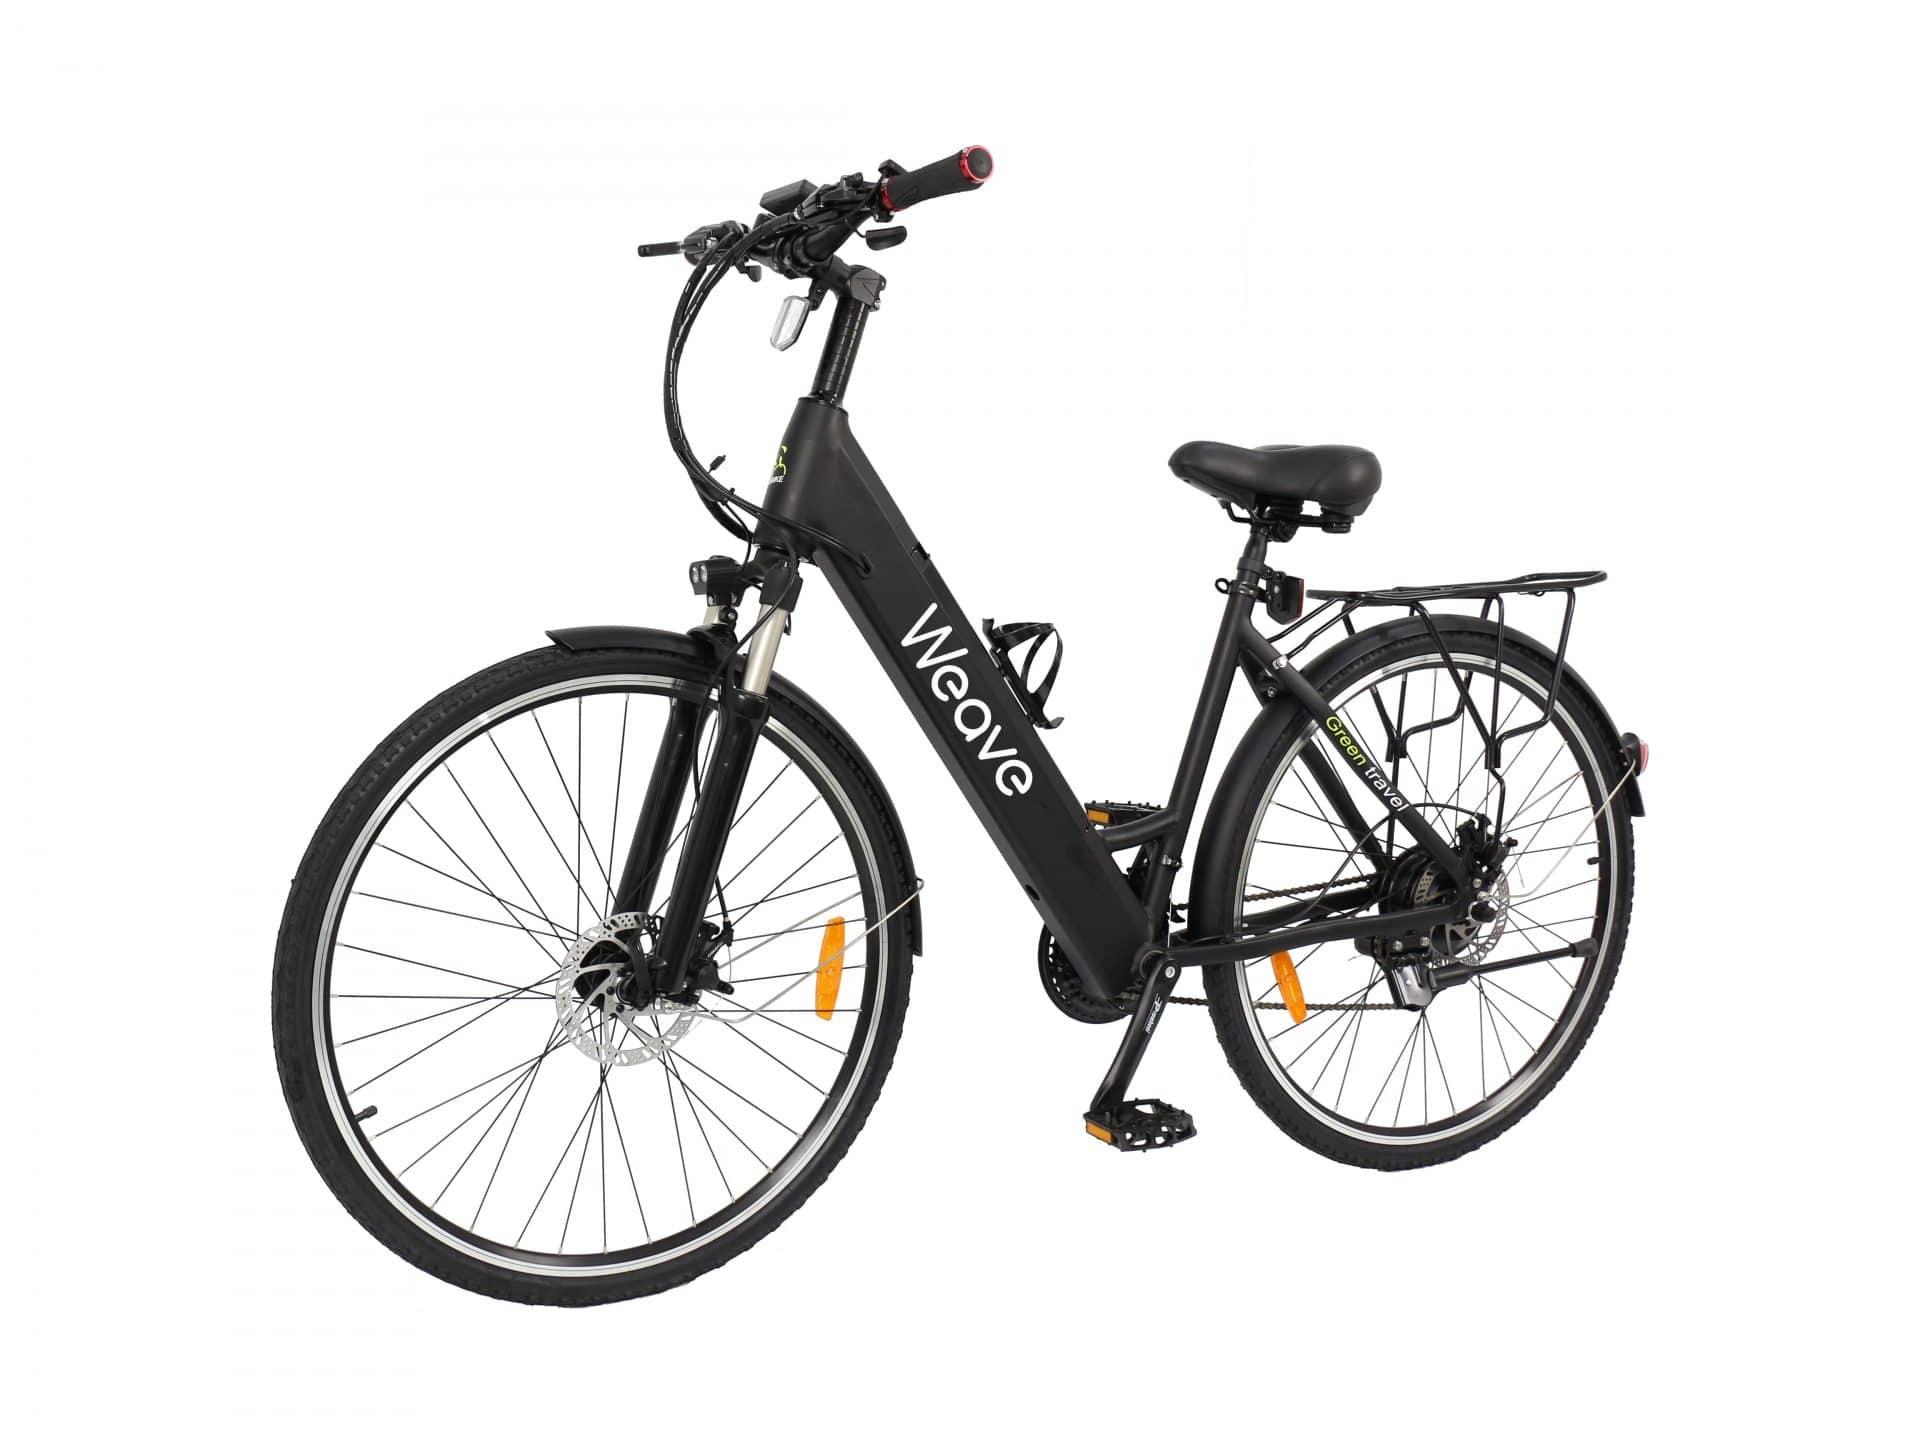 Weave City Electric Bikes